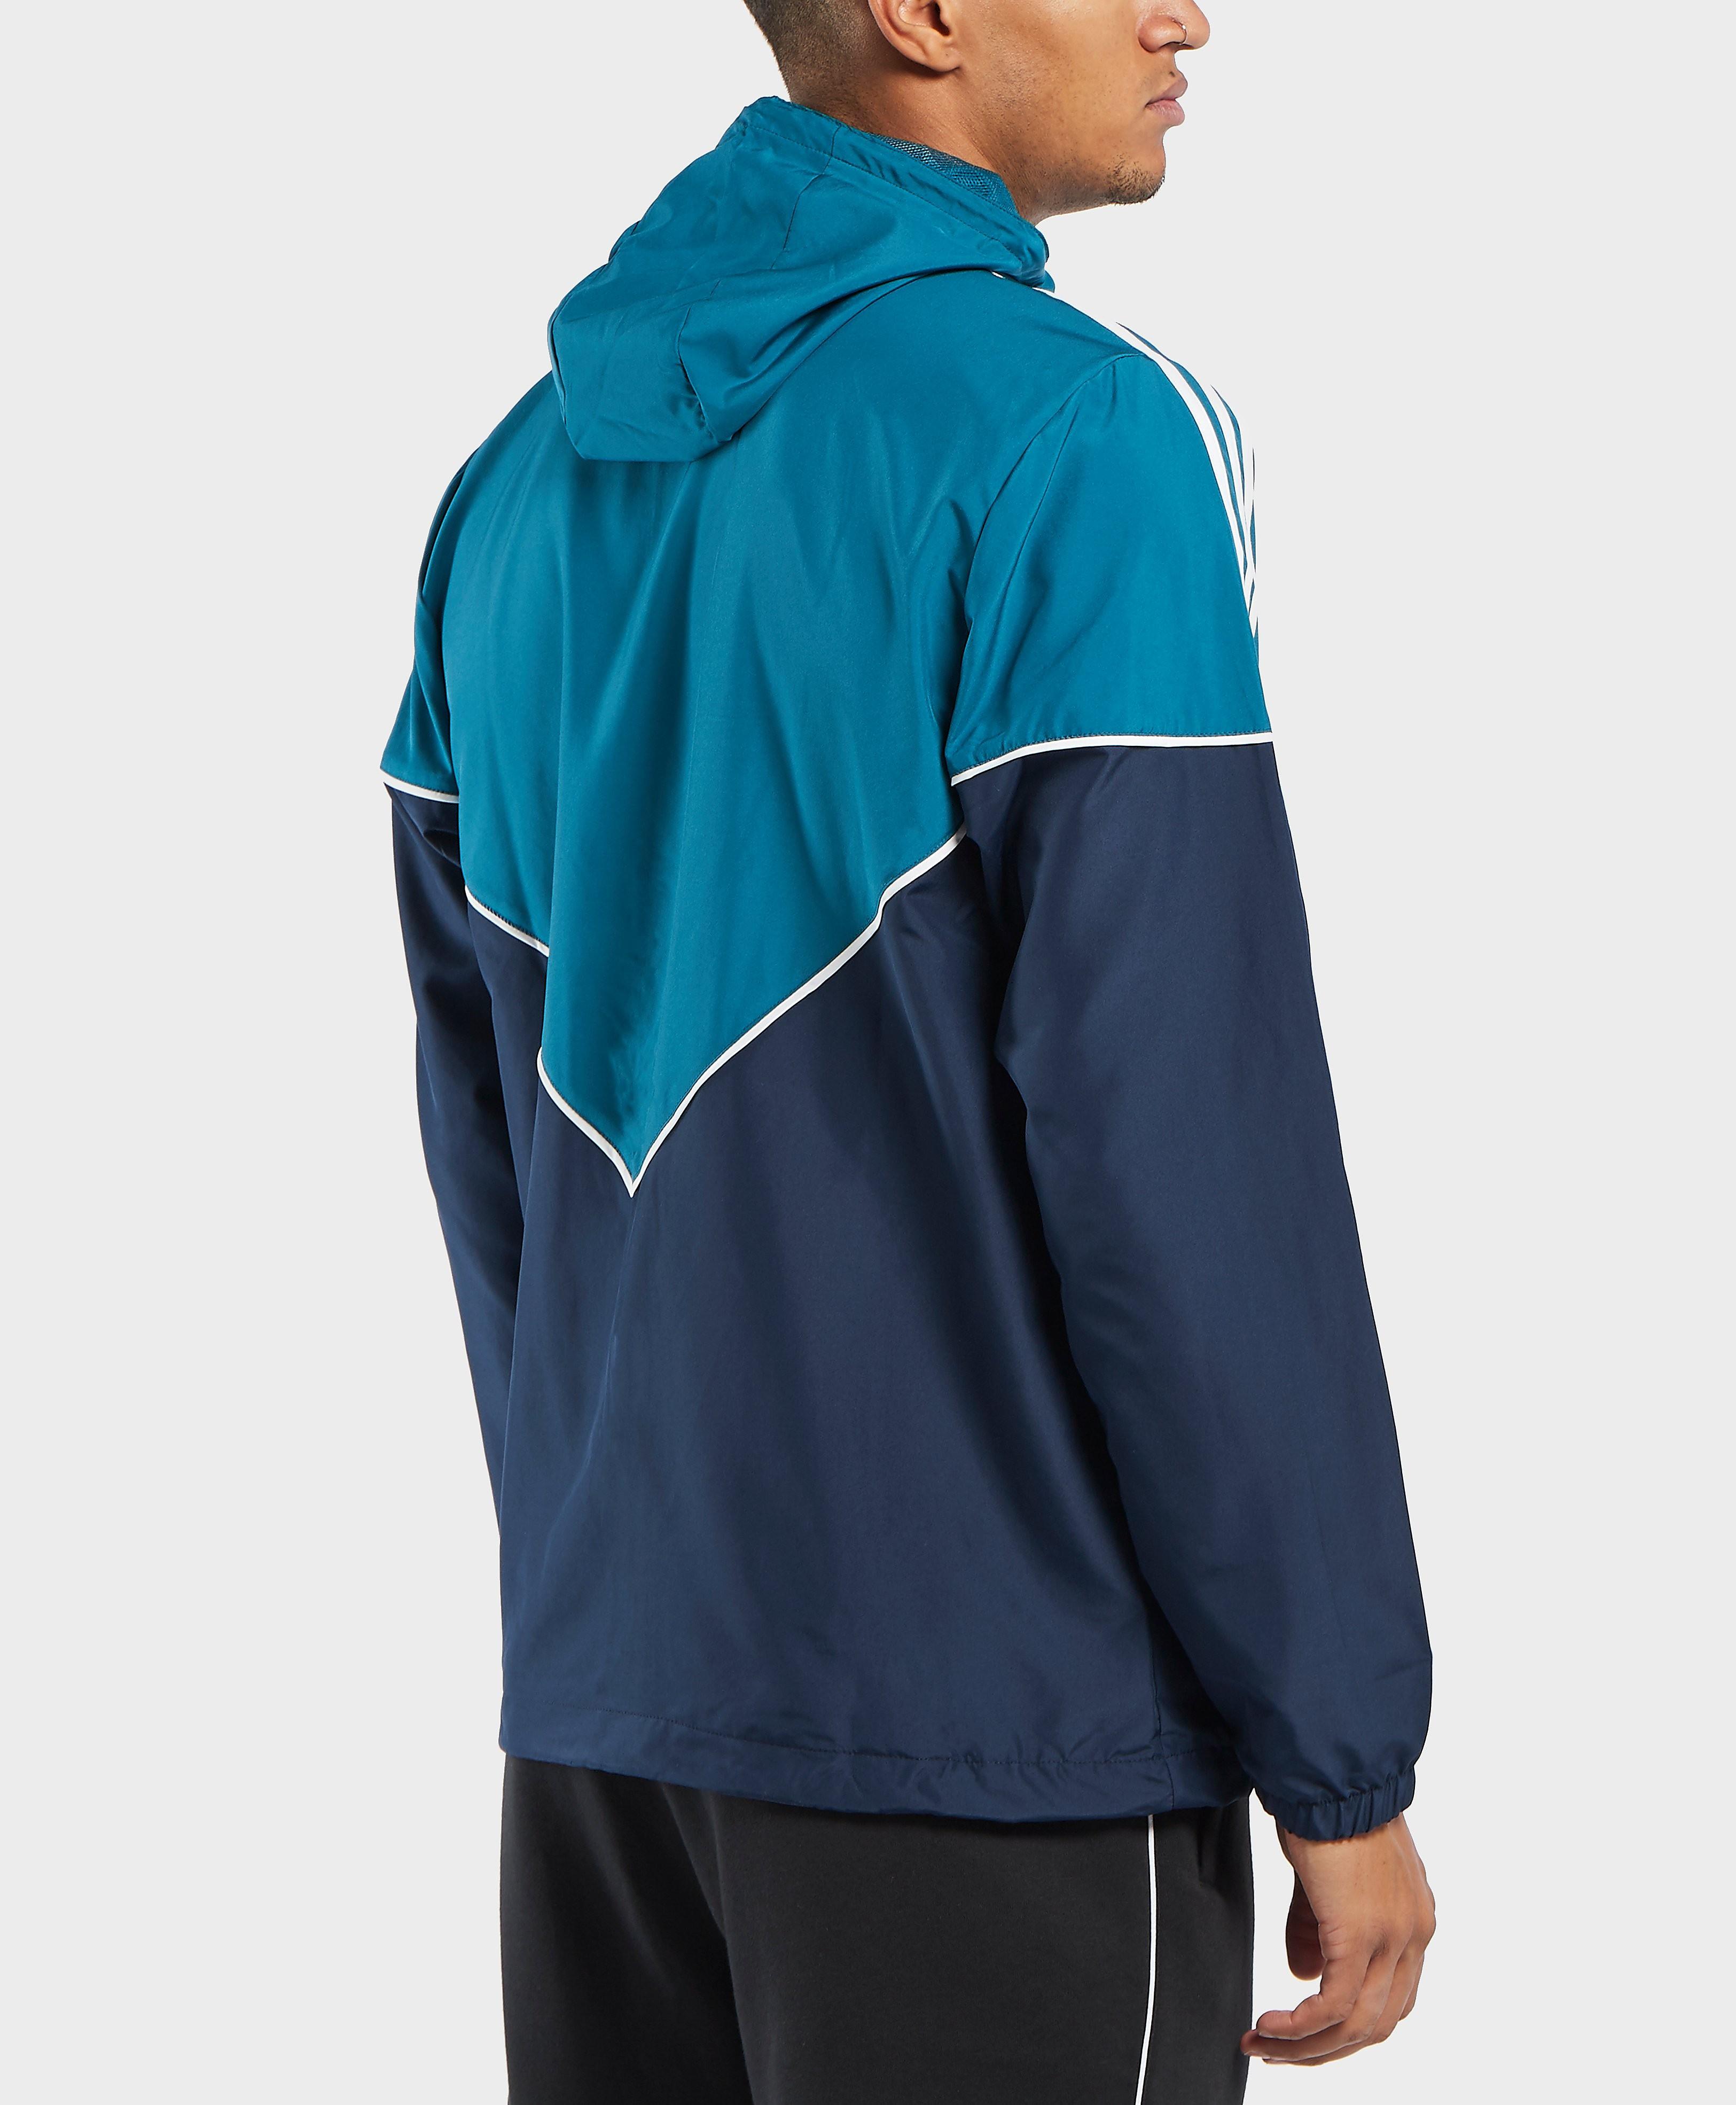 Sale Adidas Originals Clothing Scotts Menswear